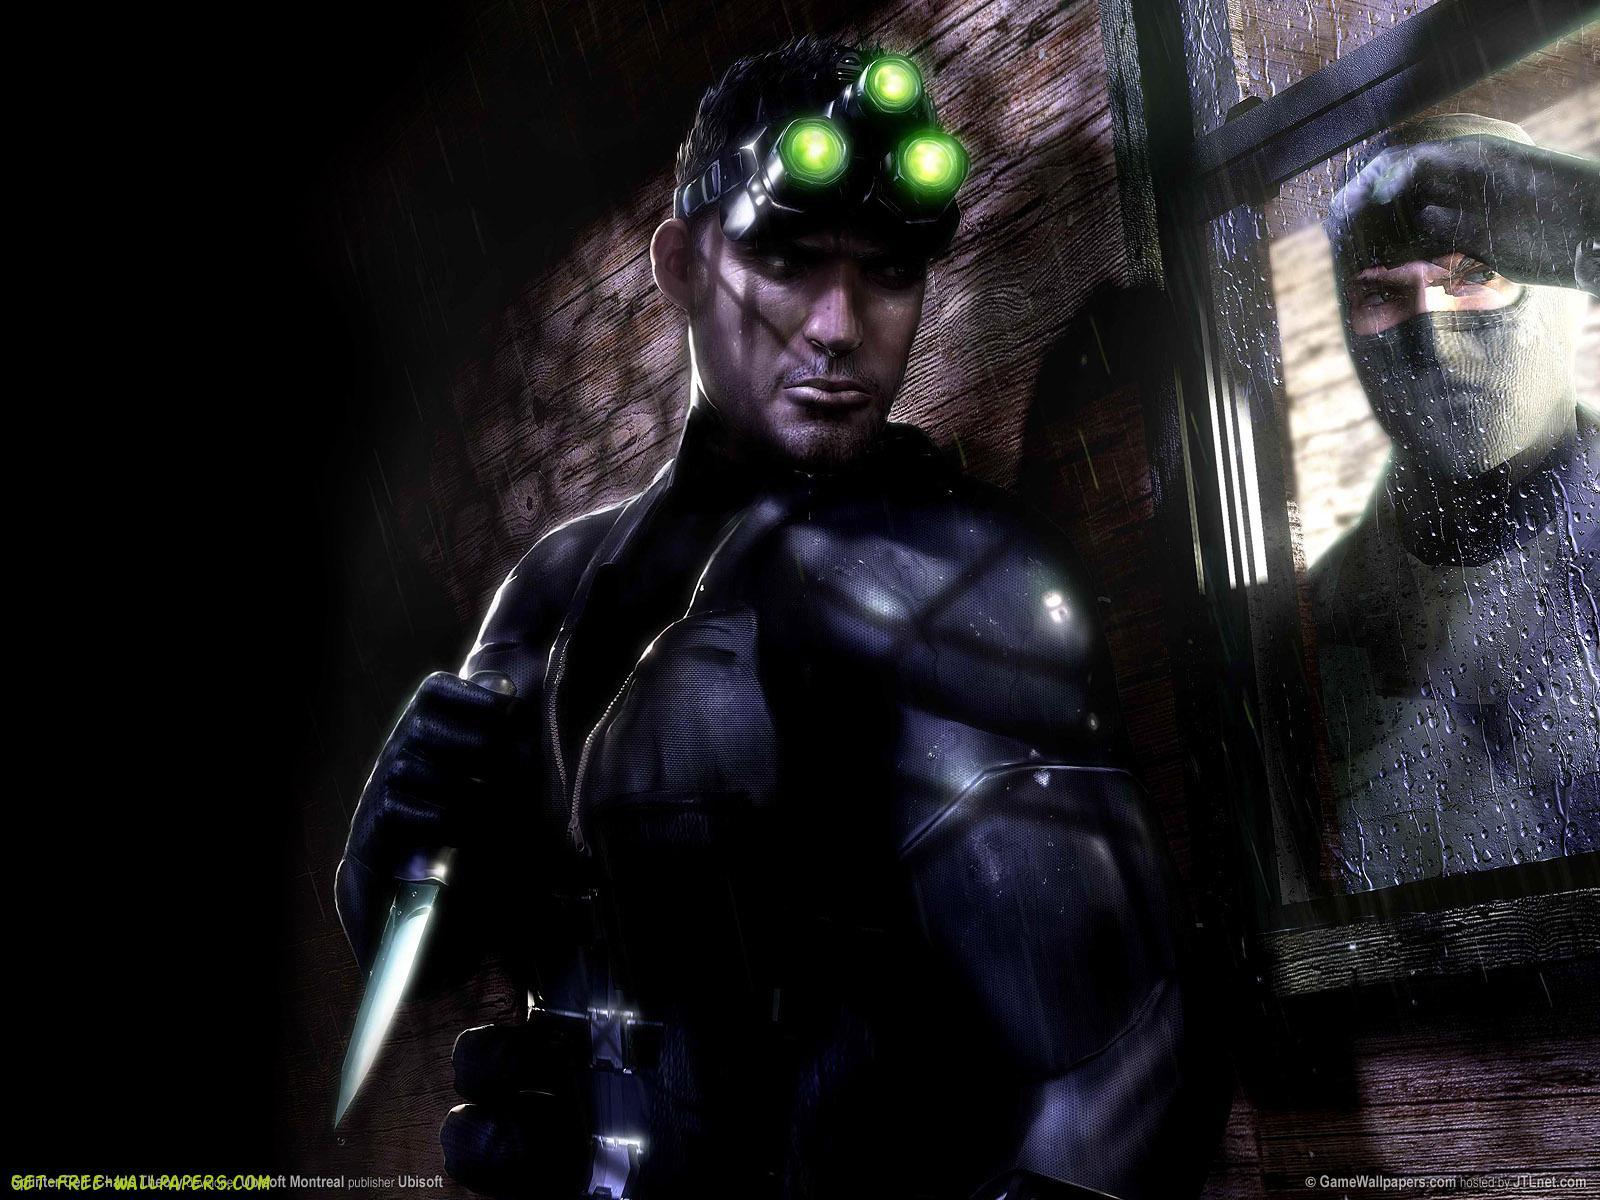 Download Splinter Cell Chaos Theory Wallpaper 1600x1200